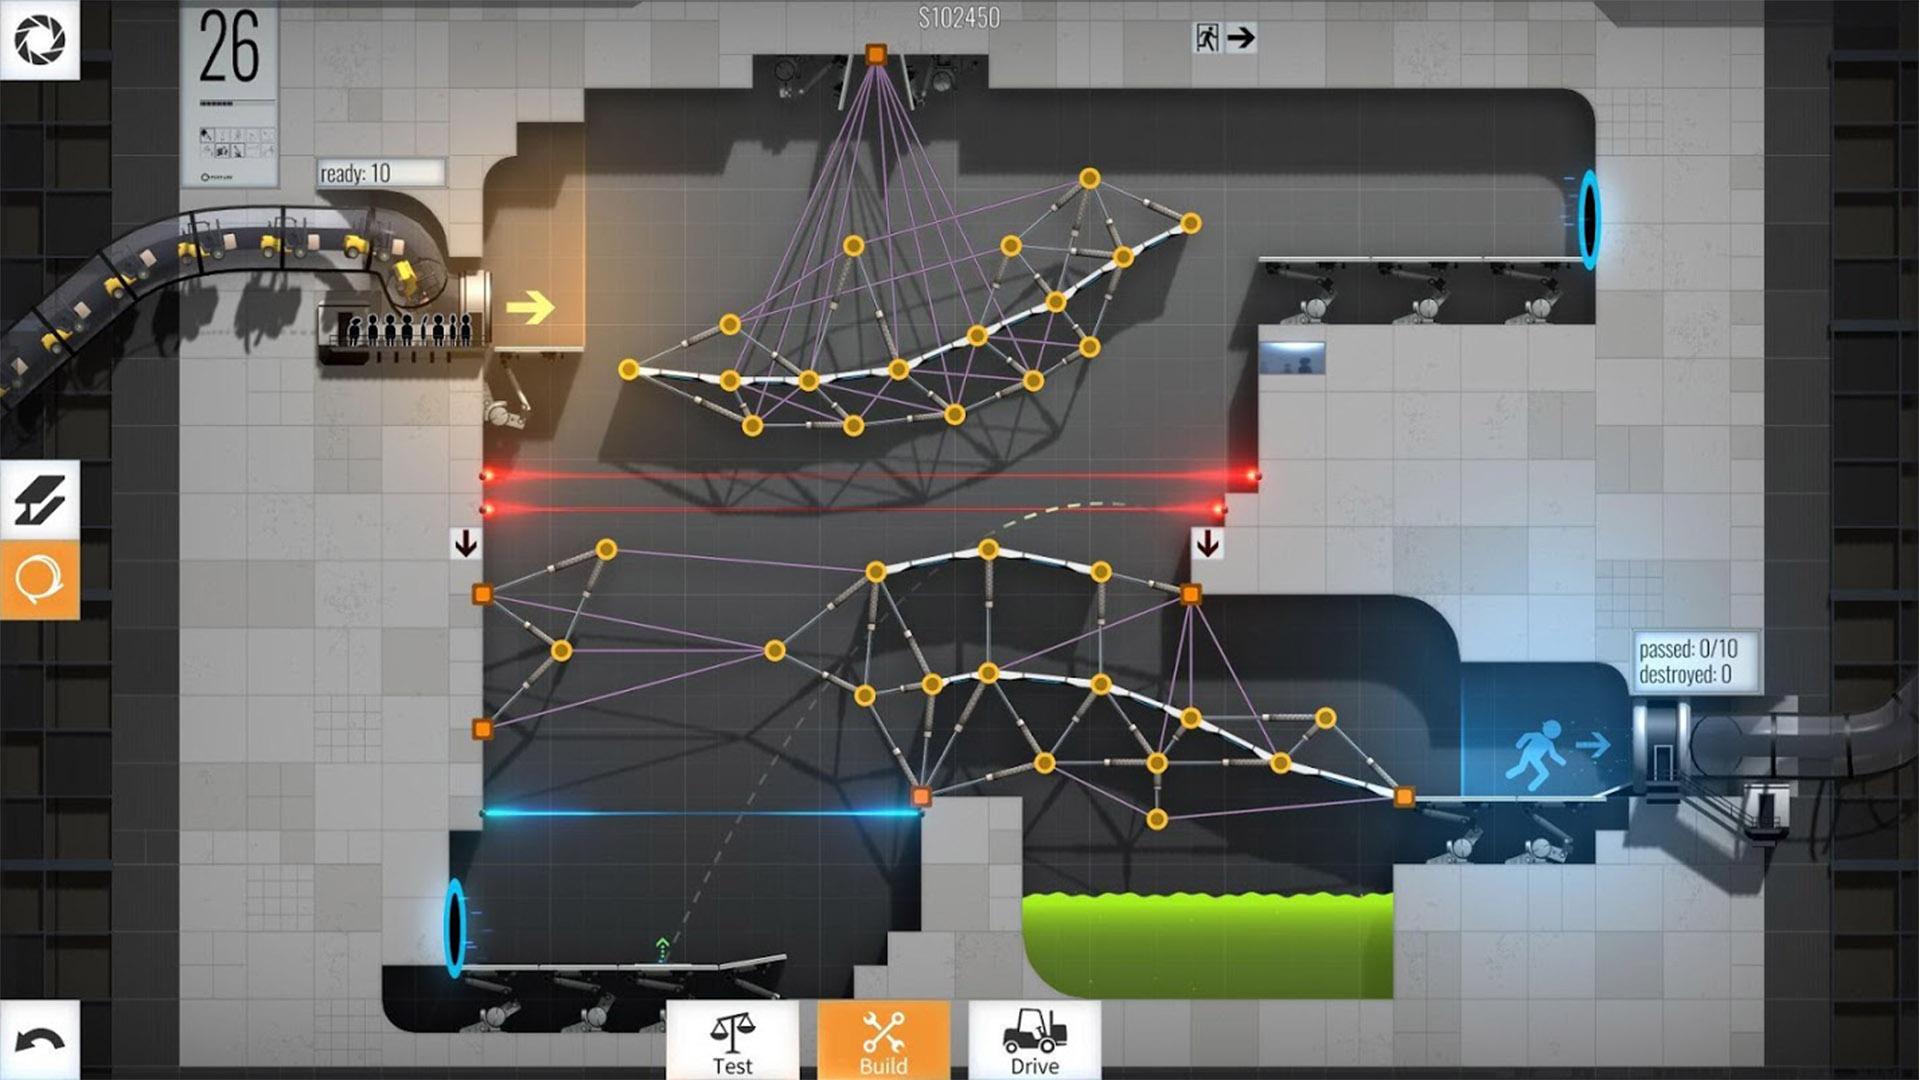 Bridge Constructor Portal best Chromebook games